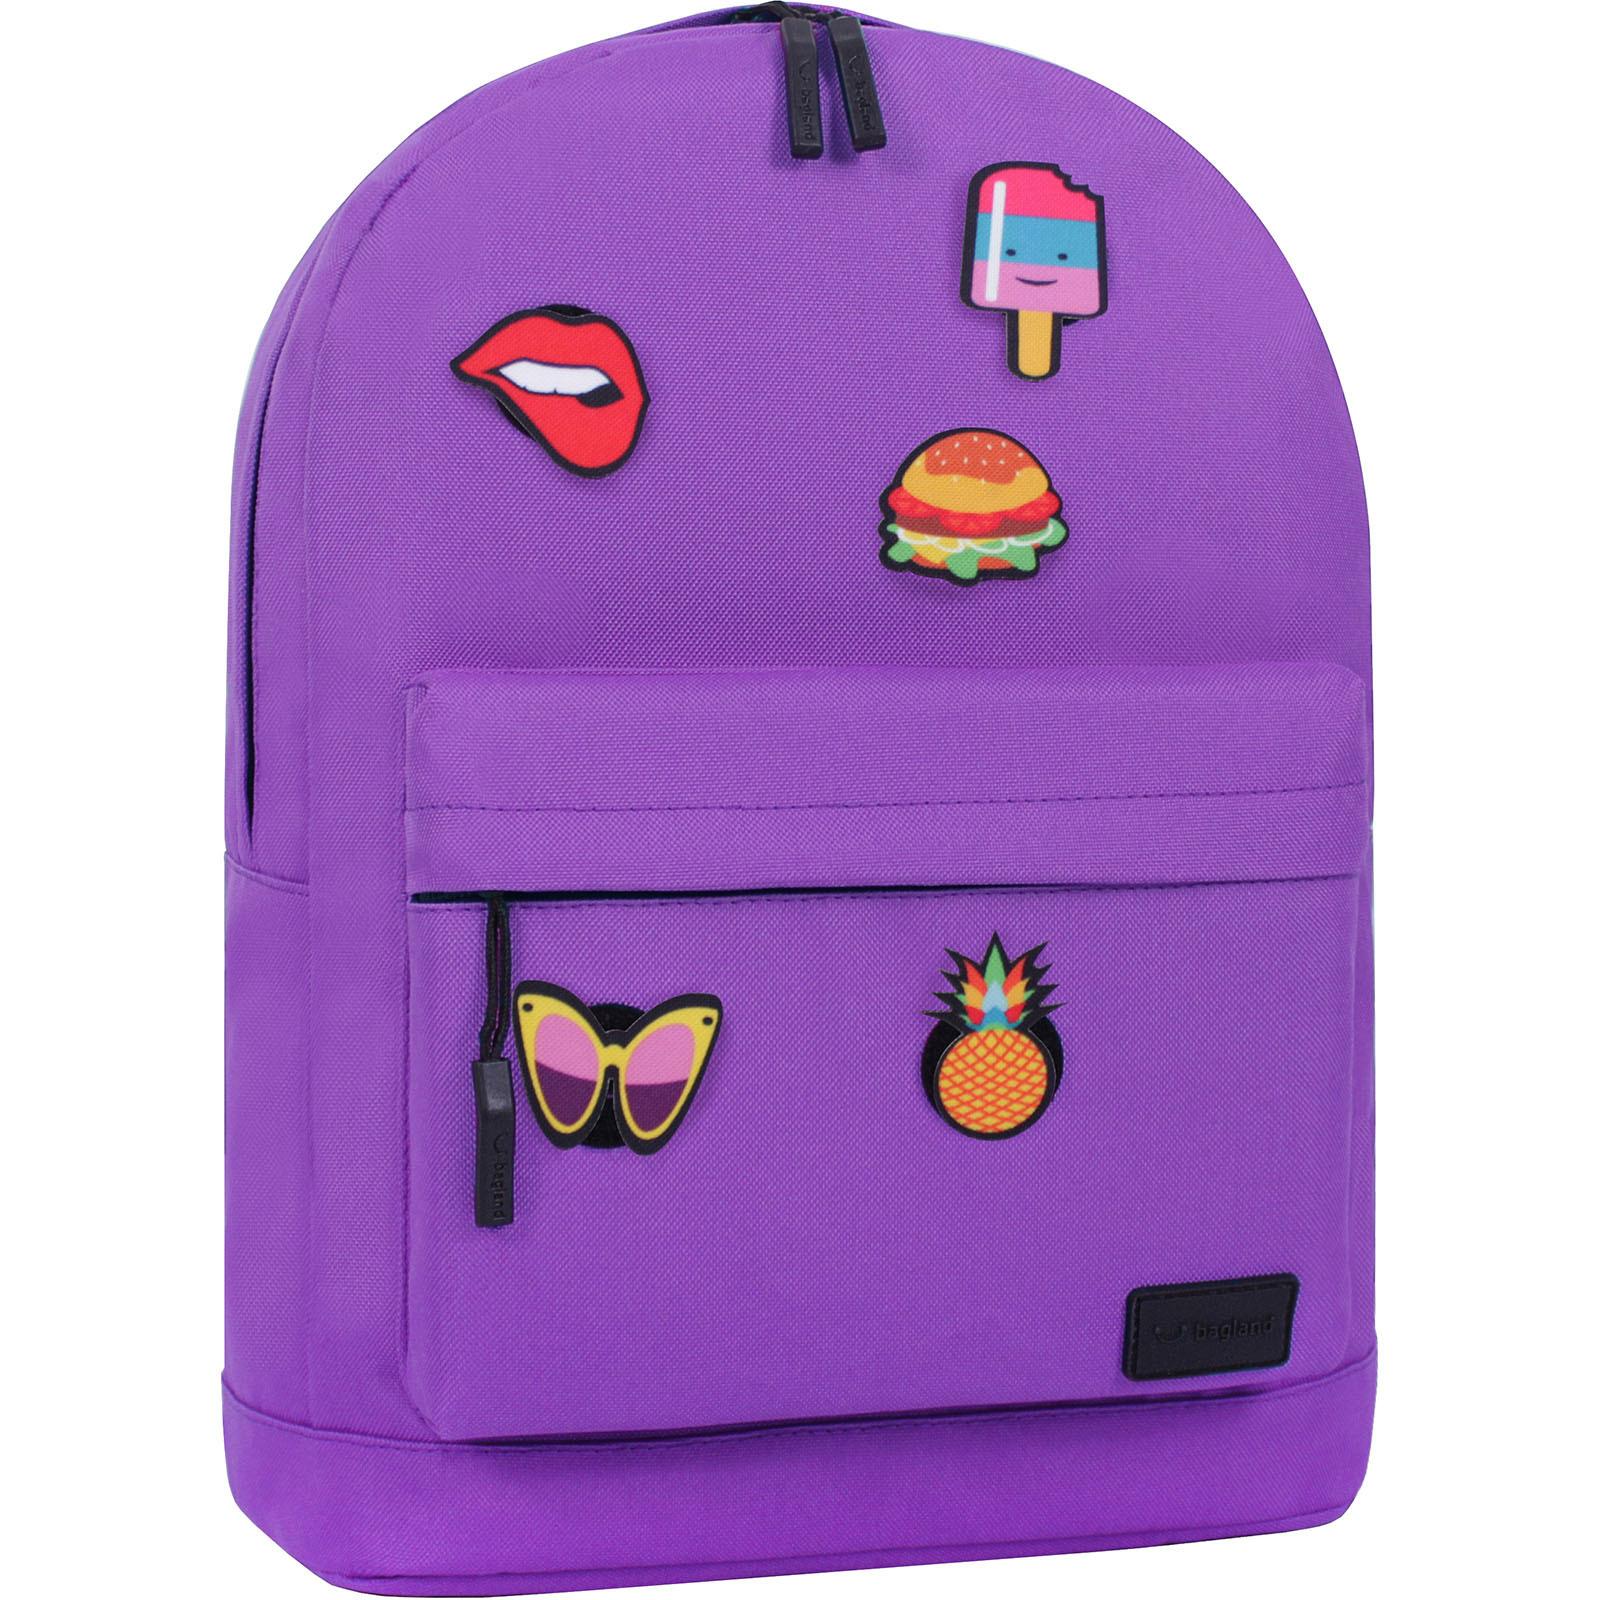 Молодежные рюкзаки Рюкзак Bagland Молодежный W/R 17 л. 170 Фиолетовый (00533662 Ш) IMG_2901.JPG